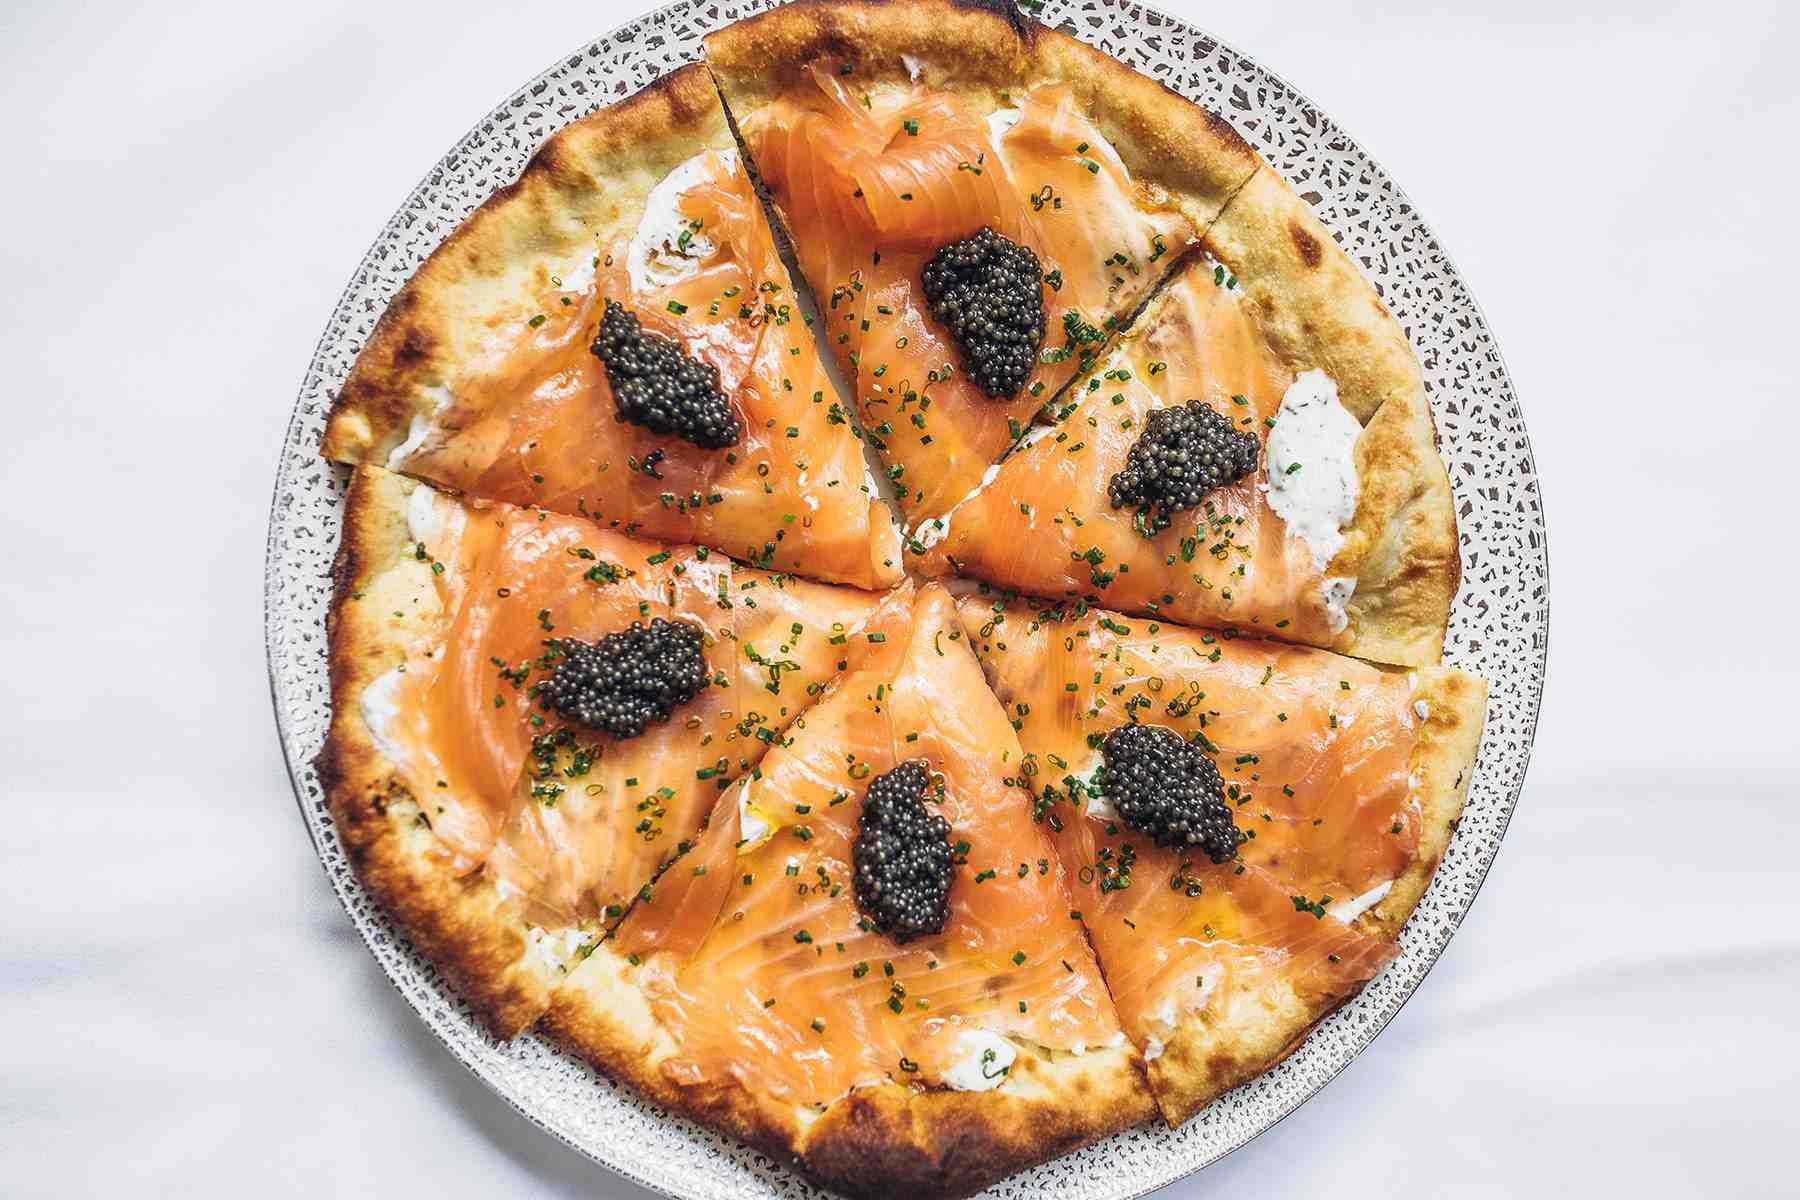 Smoked salmon and caviar pizza at Spago